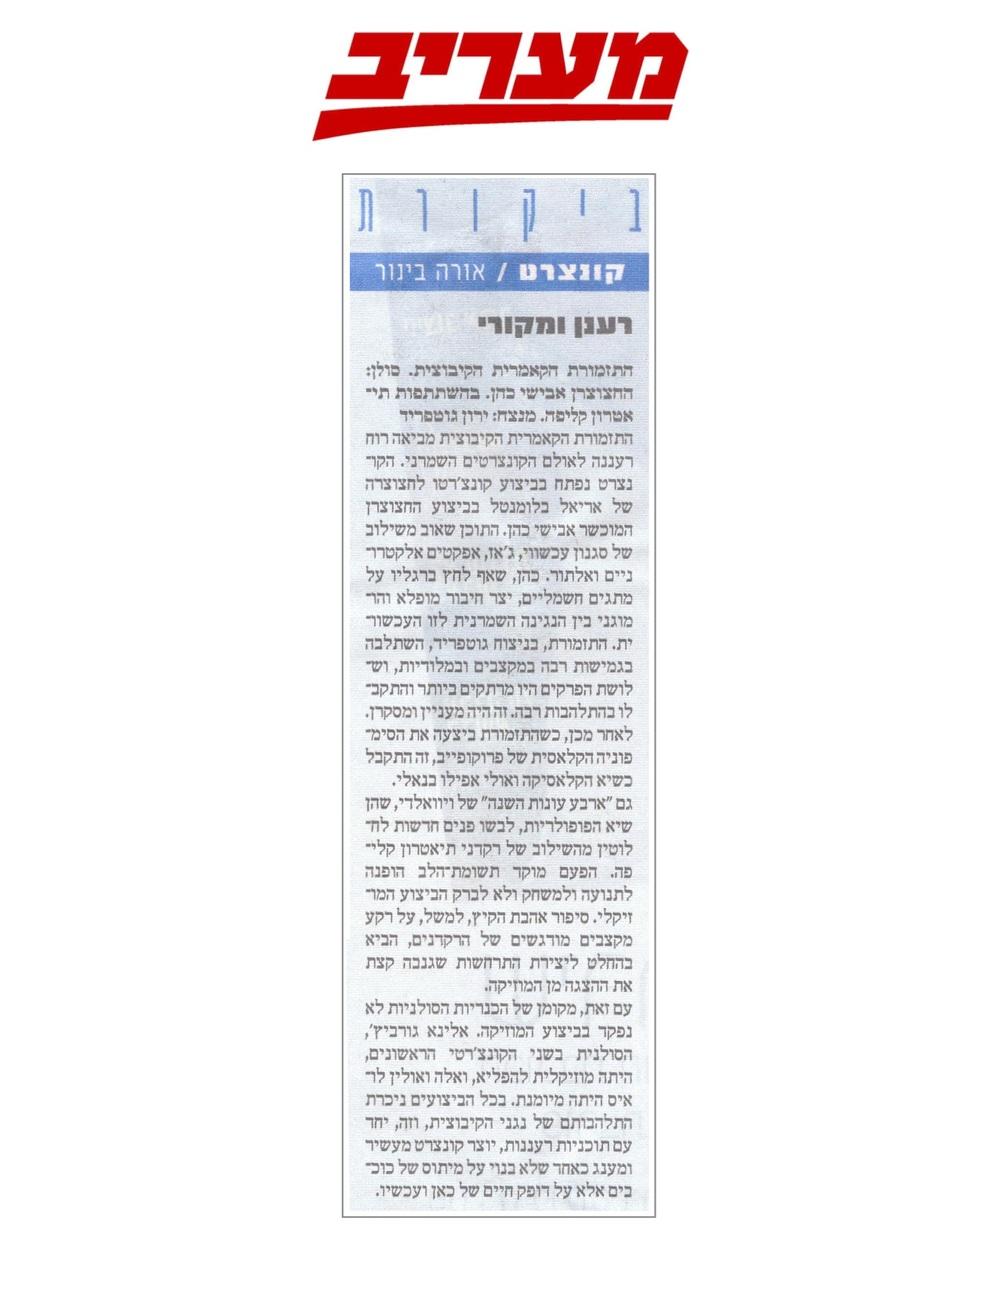 Tpt Conc_Maariv.jpg